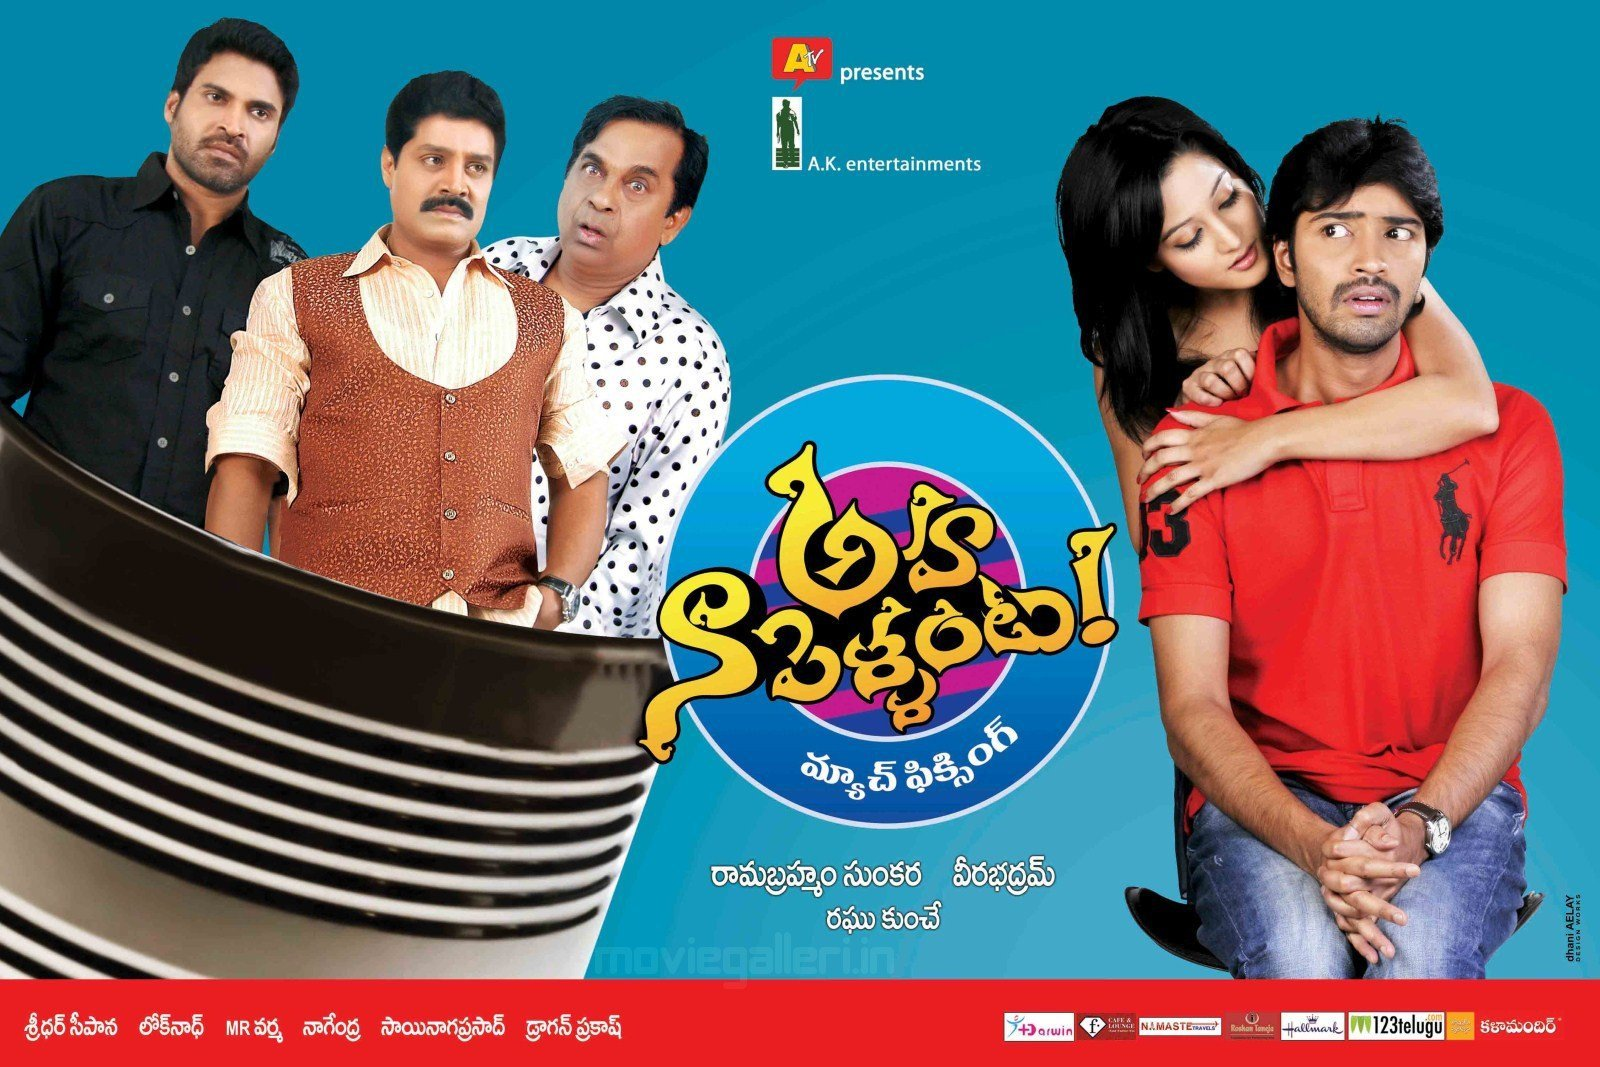 Aha Naa Pellanta Movie Poster